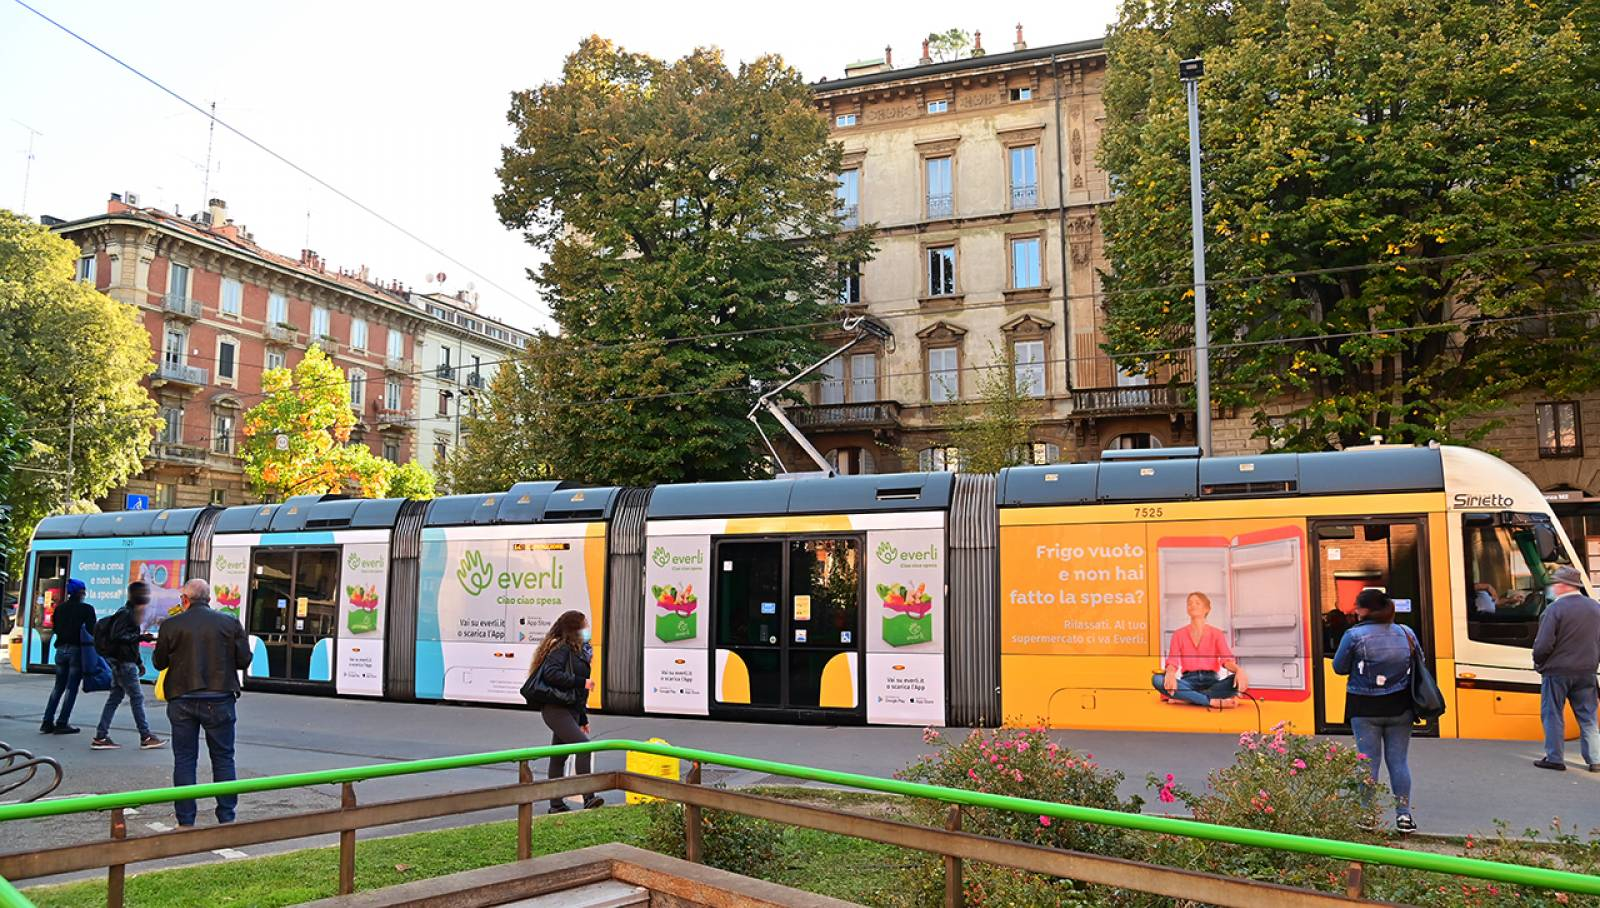 Pubblicità Out of Home a Milano IGPDecaux Full-Wrap per Everli